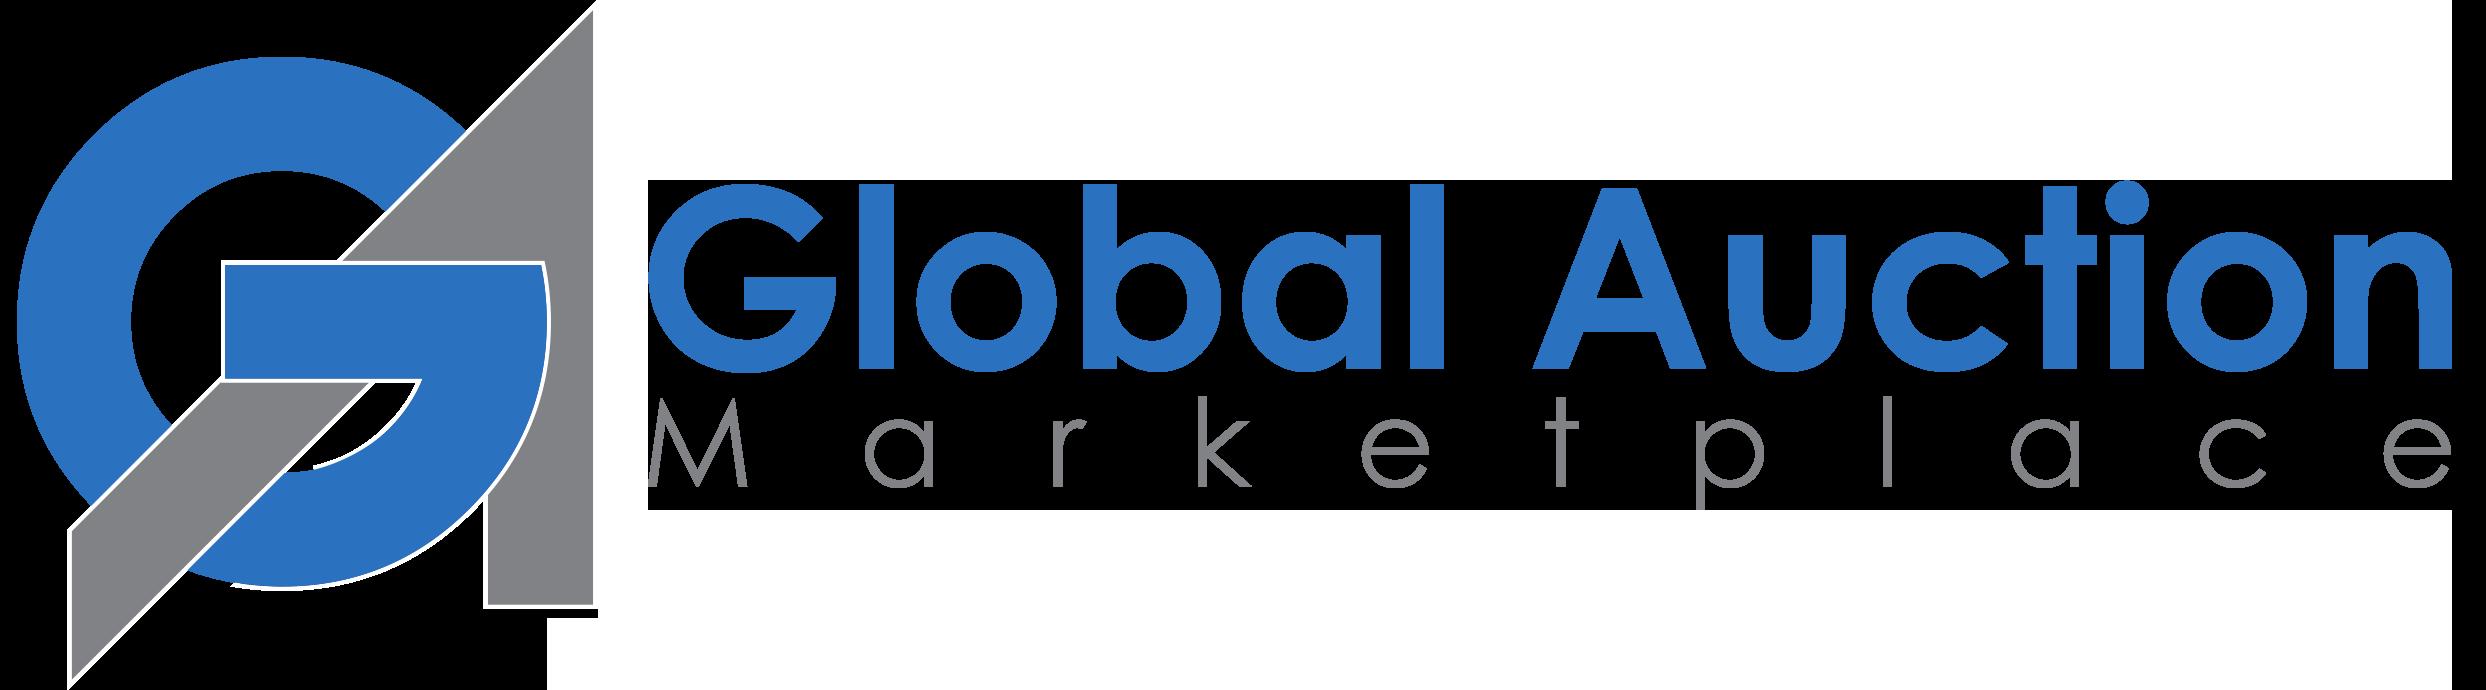 Global Auction Marketplace